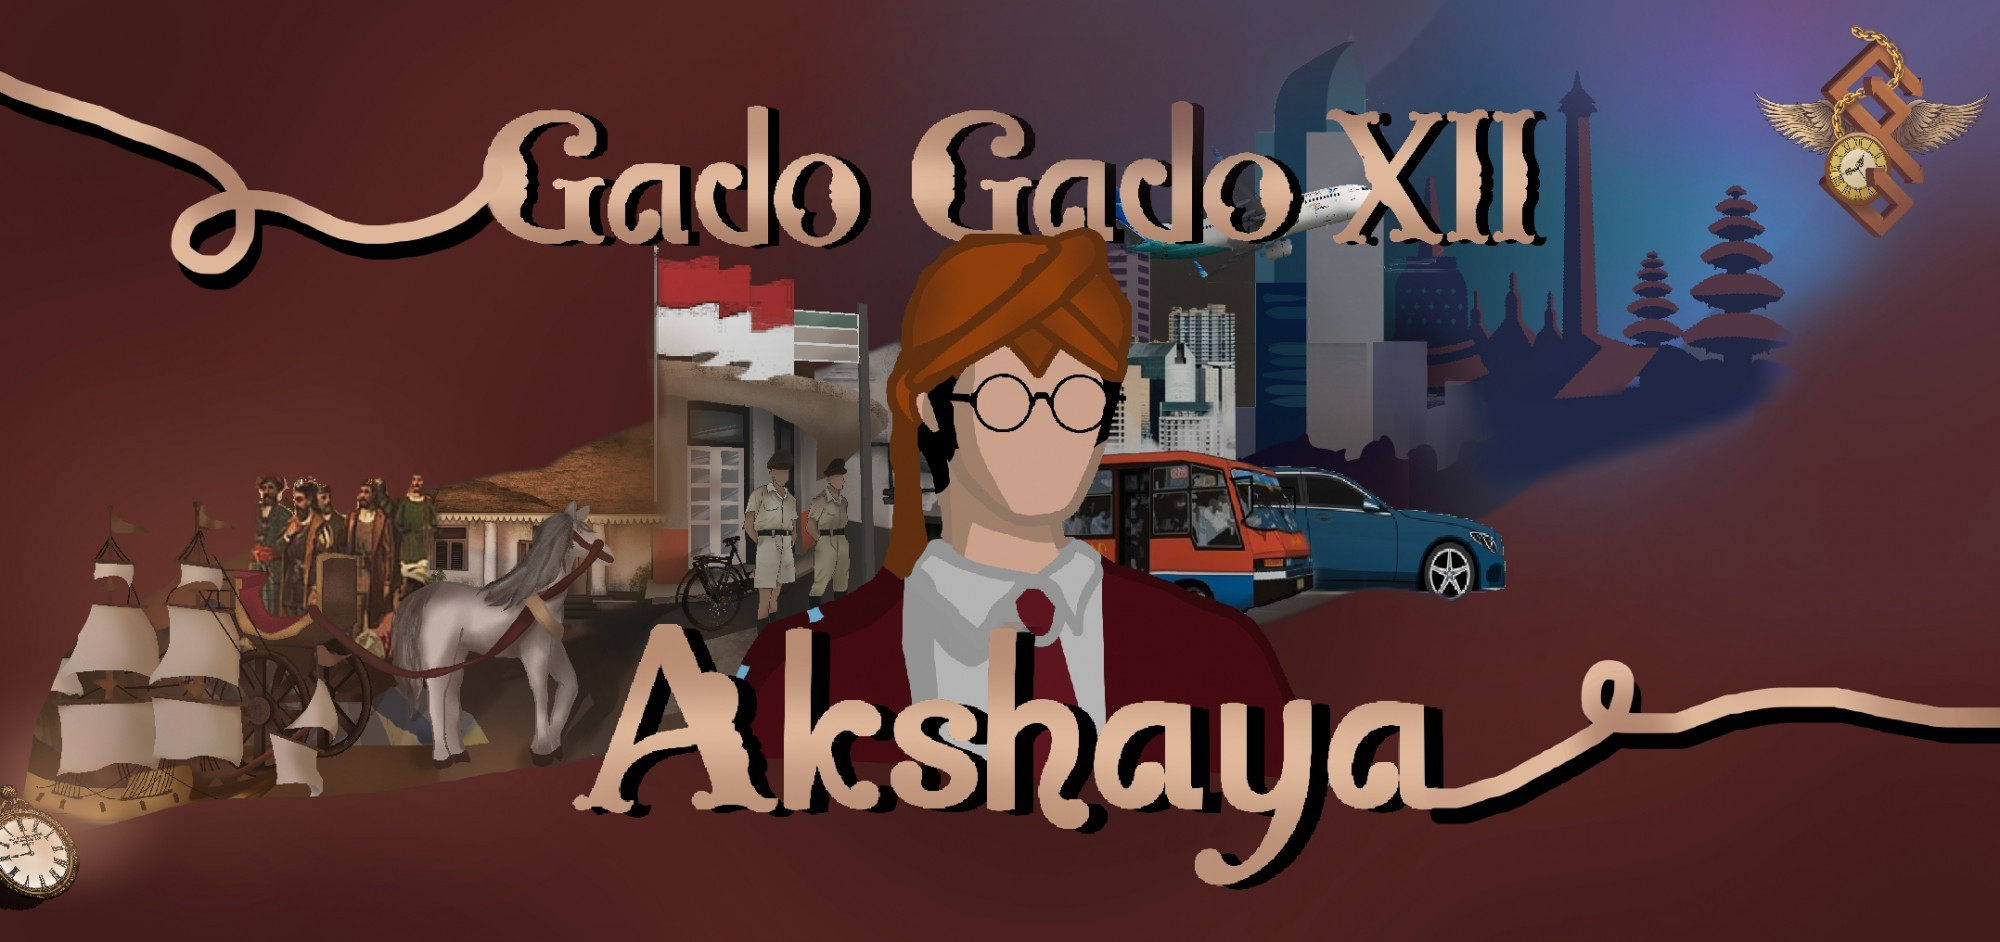 GADOGADO XII: AKSHAYA